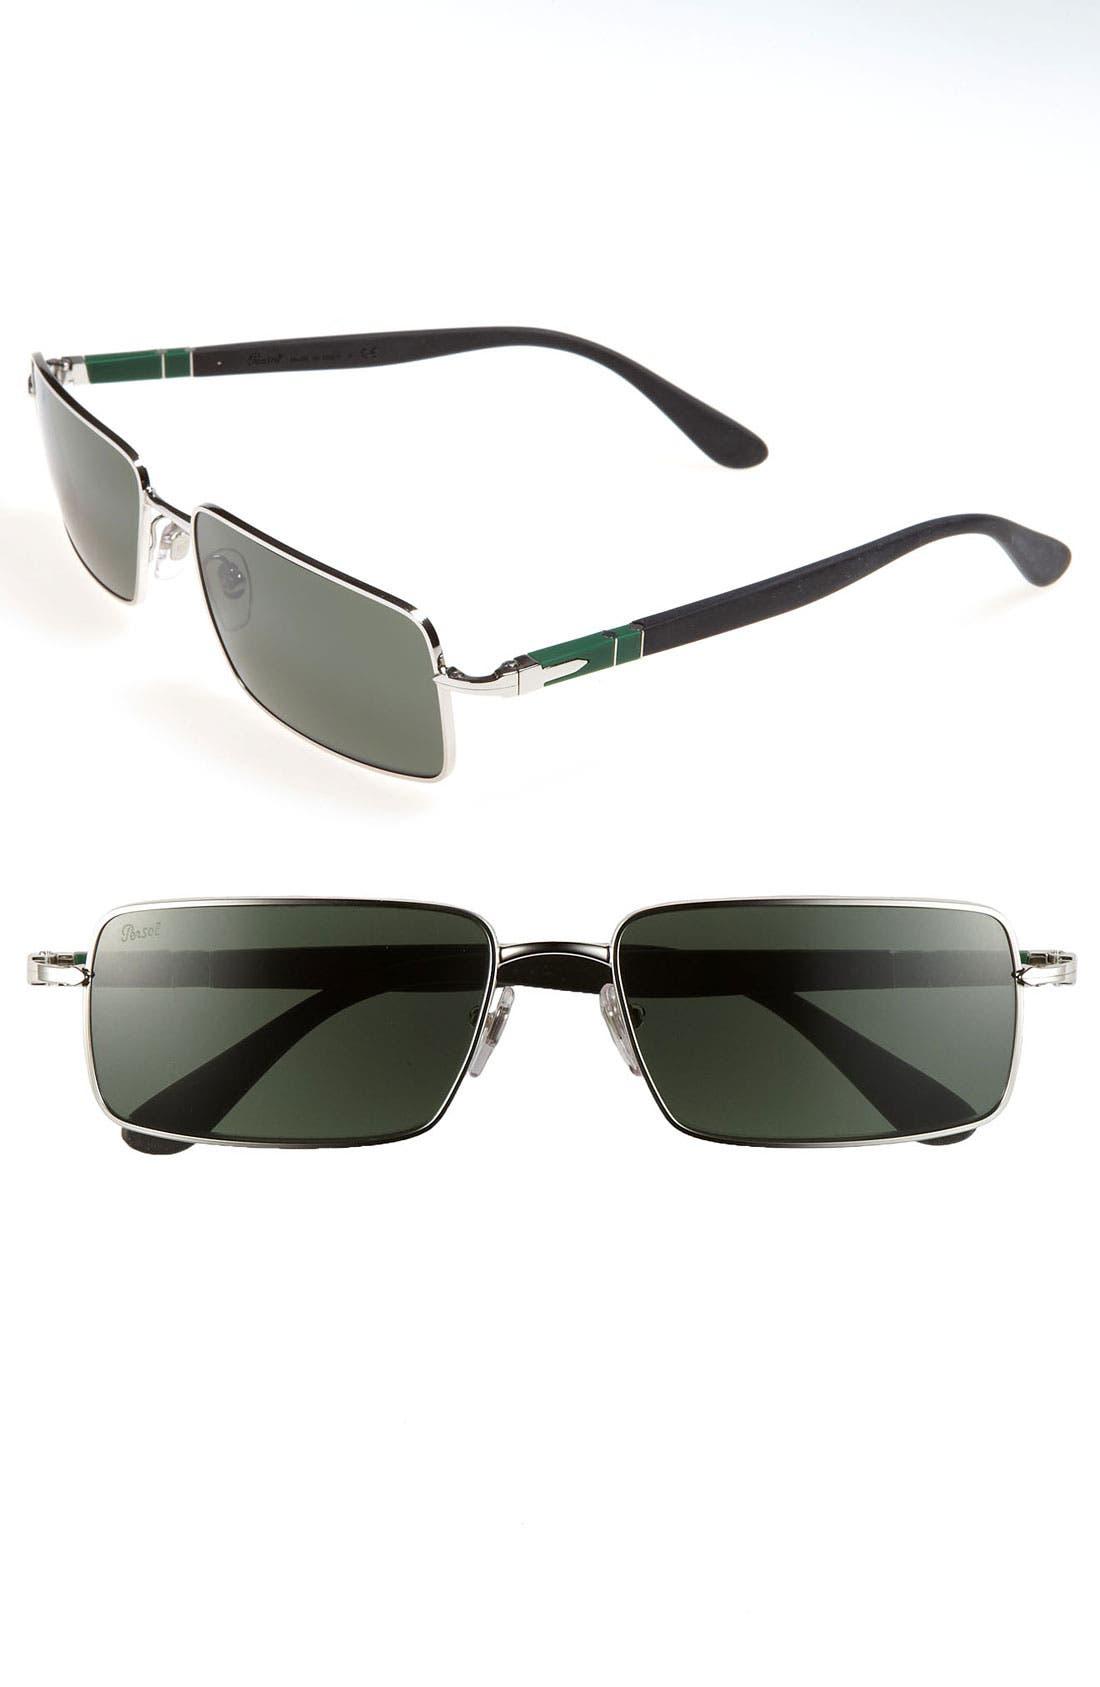 Main Image - Persol 'Steelman' Sunglasses